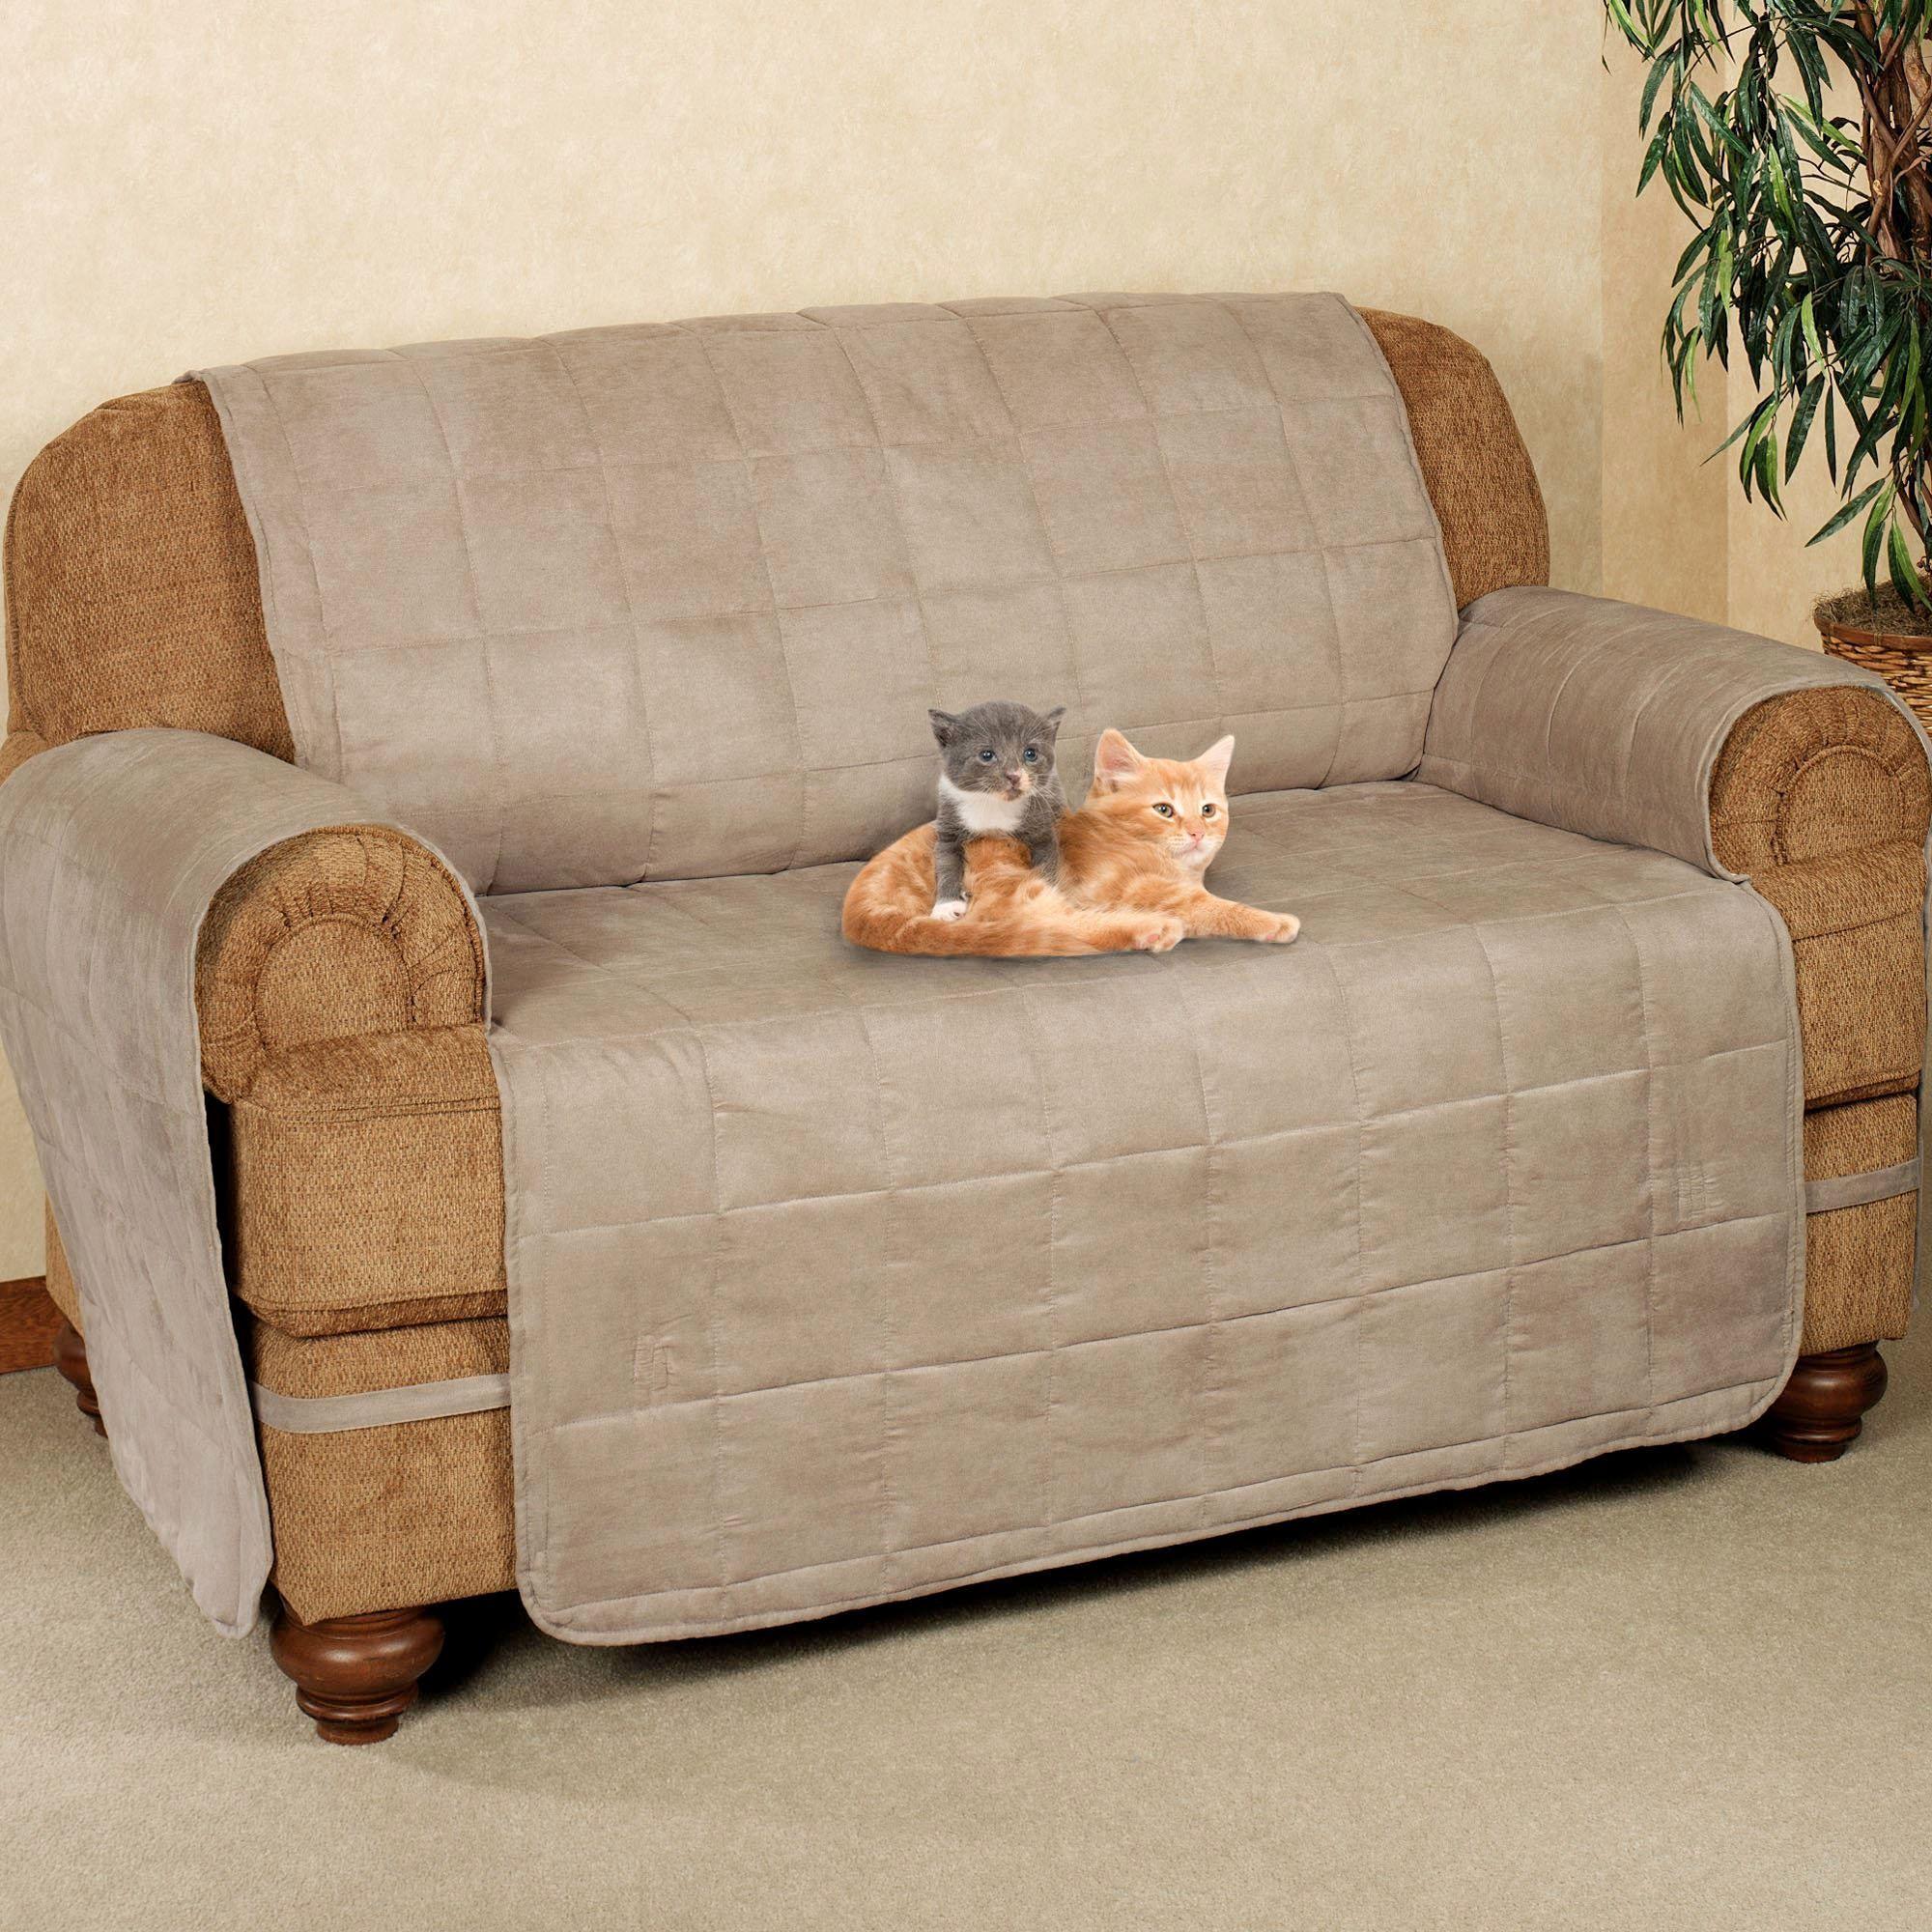 Idea Sure Fit Waterproof Sofa Cover Pics Sure Fit Waterproof Sofa